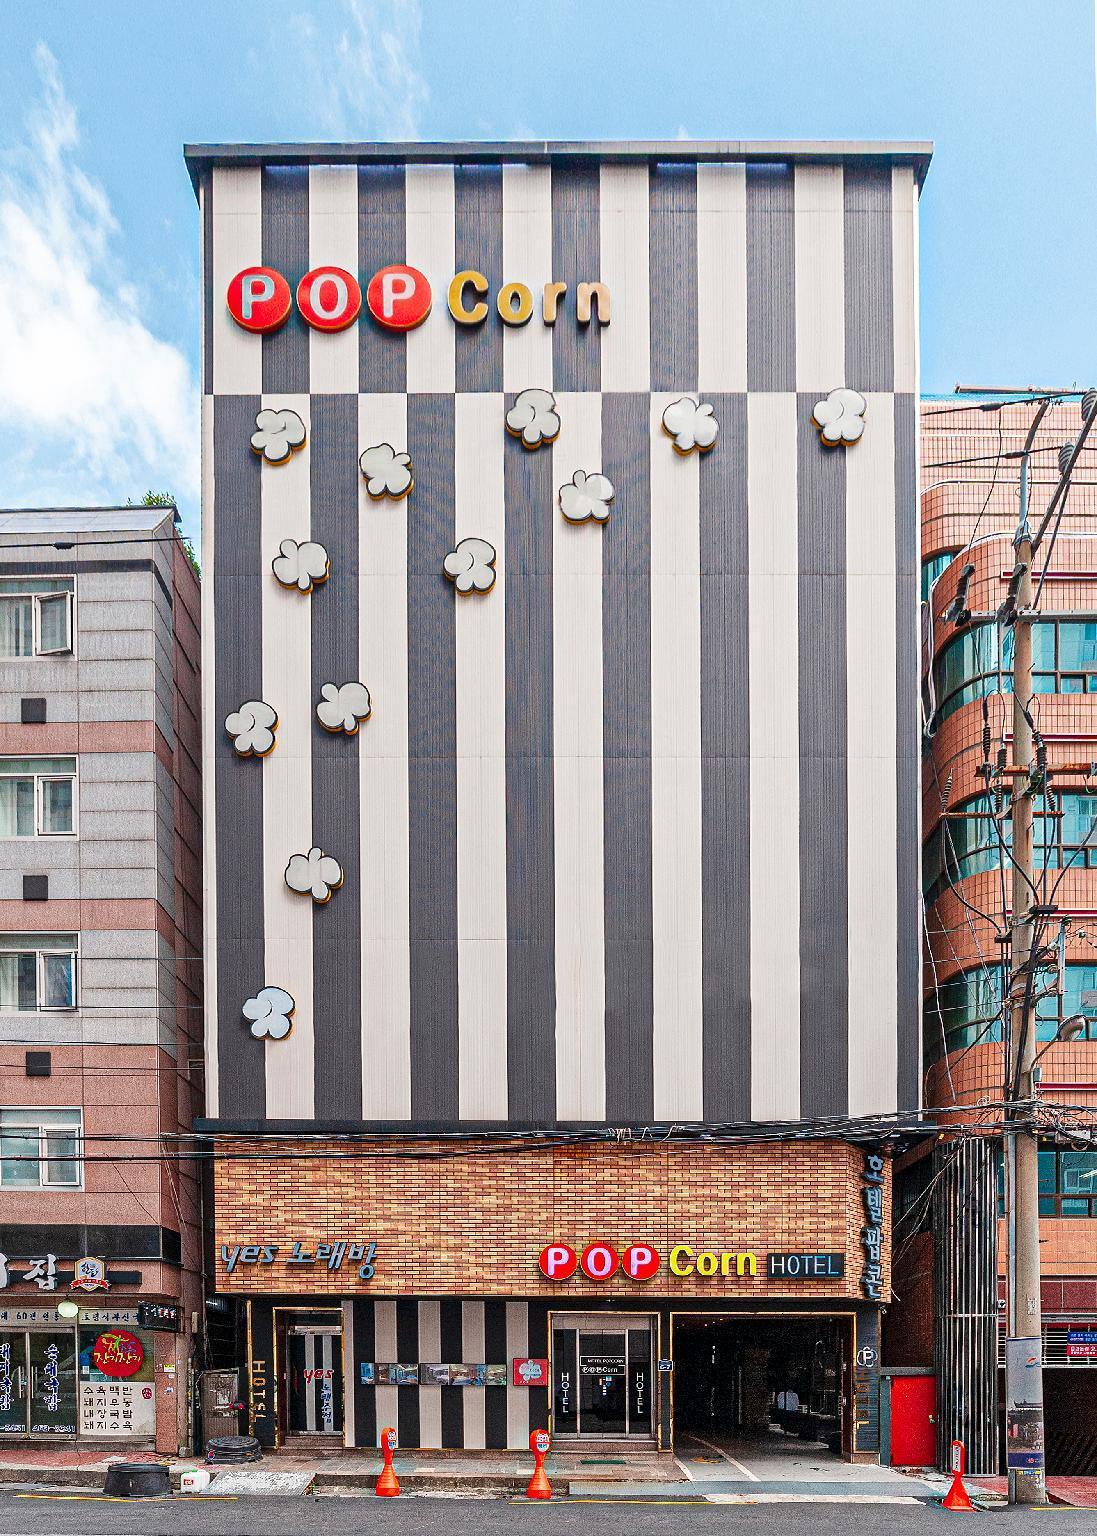 Busan Station Popcorn Hotel, Dong